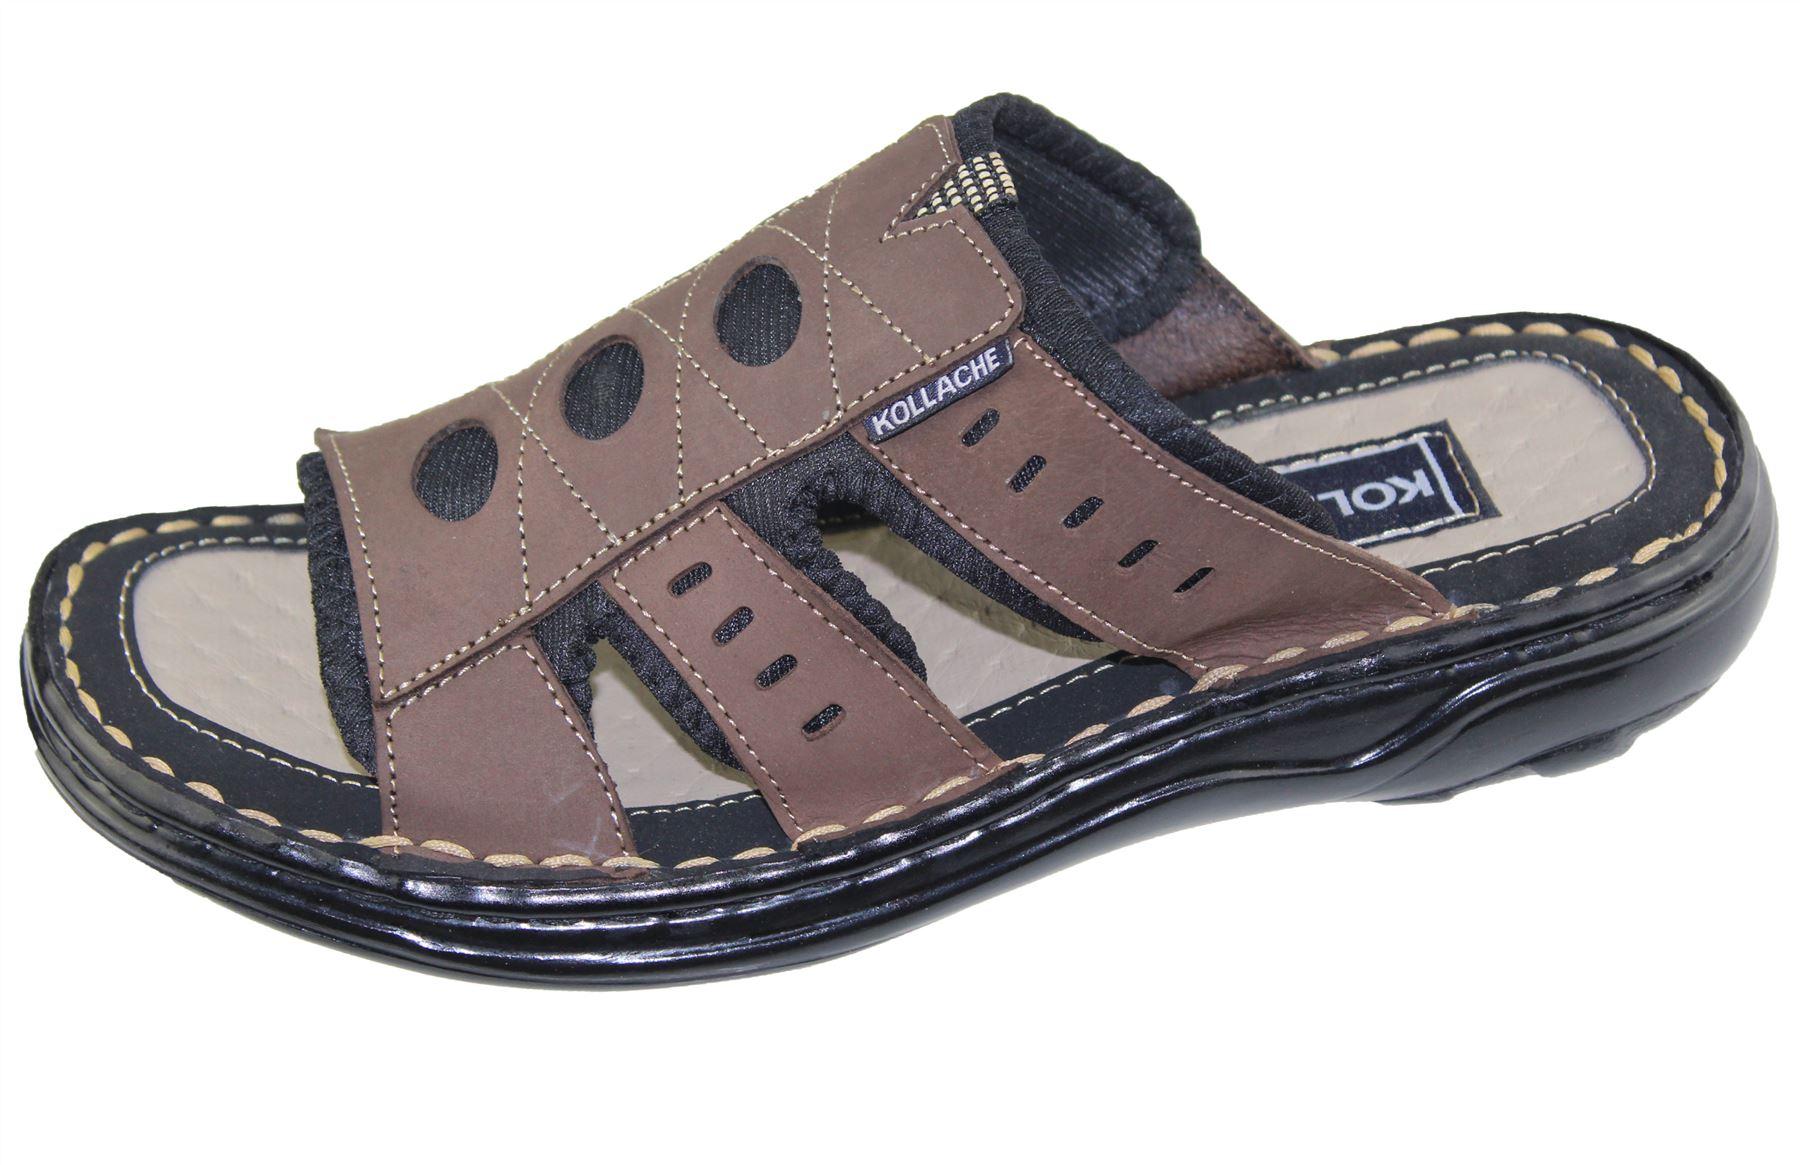 Mens-Slipper-Sandal-Sports-Beach-Buckle-Walking-Fashion-Summer-Casual-Shoes-Size miniatura 26